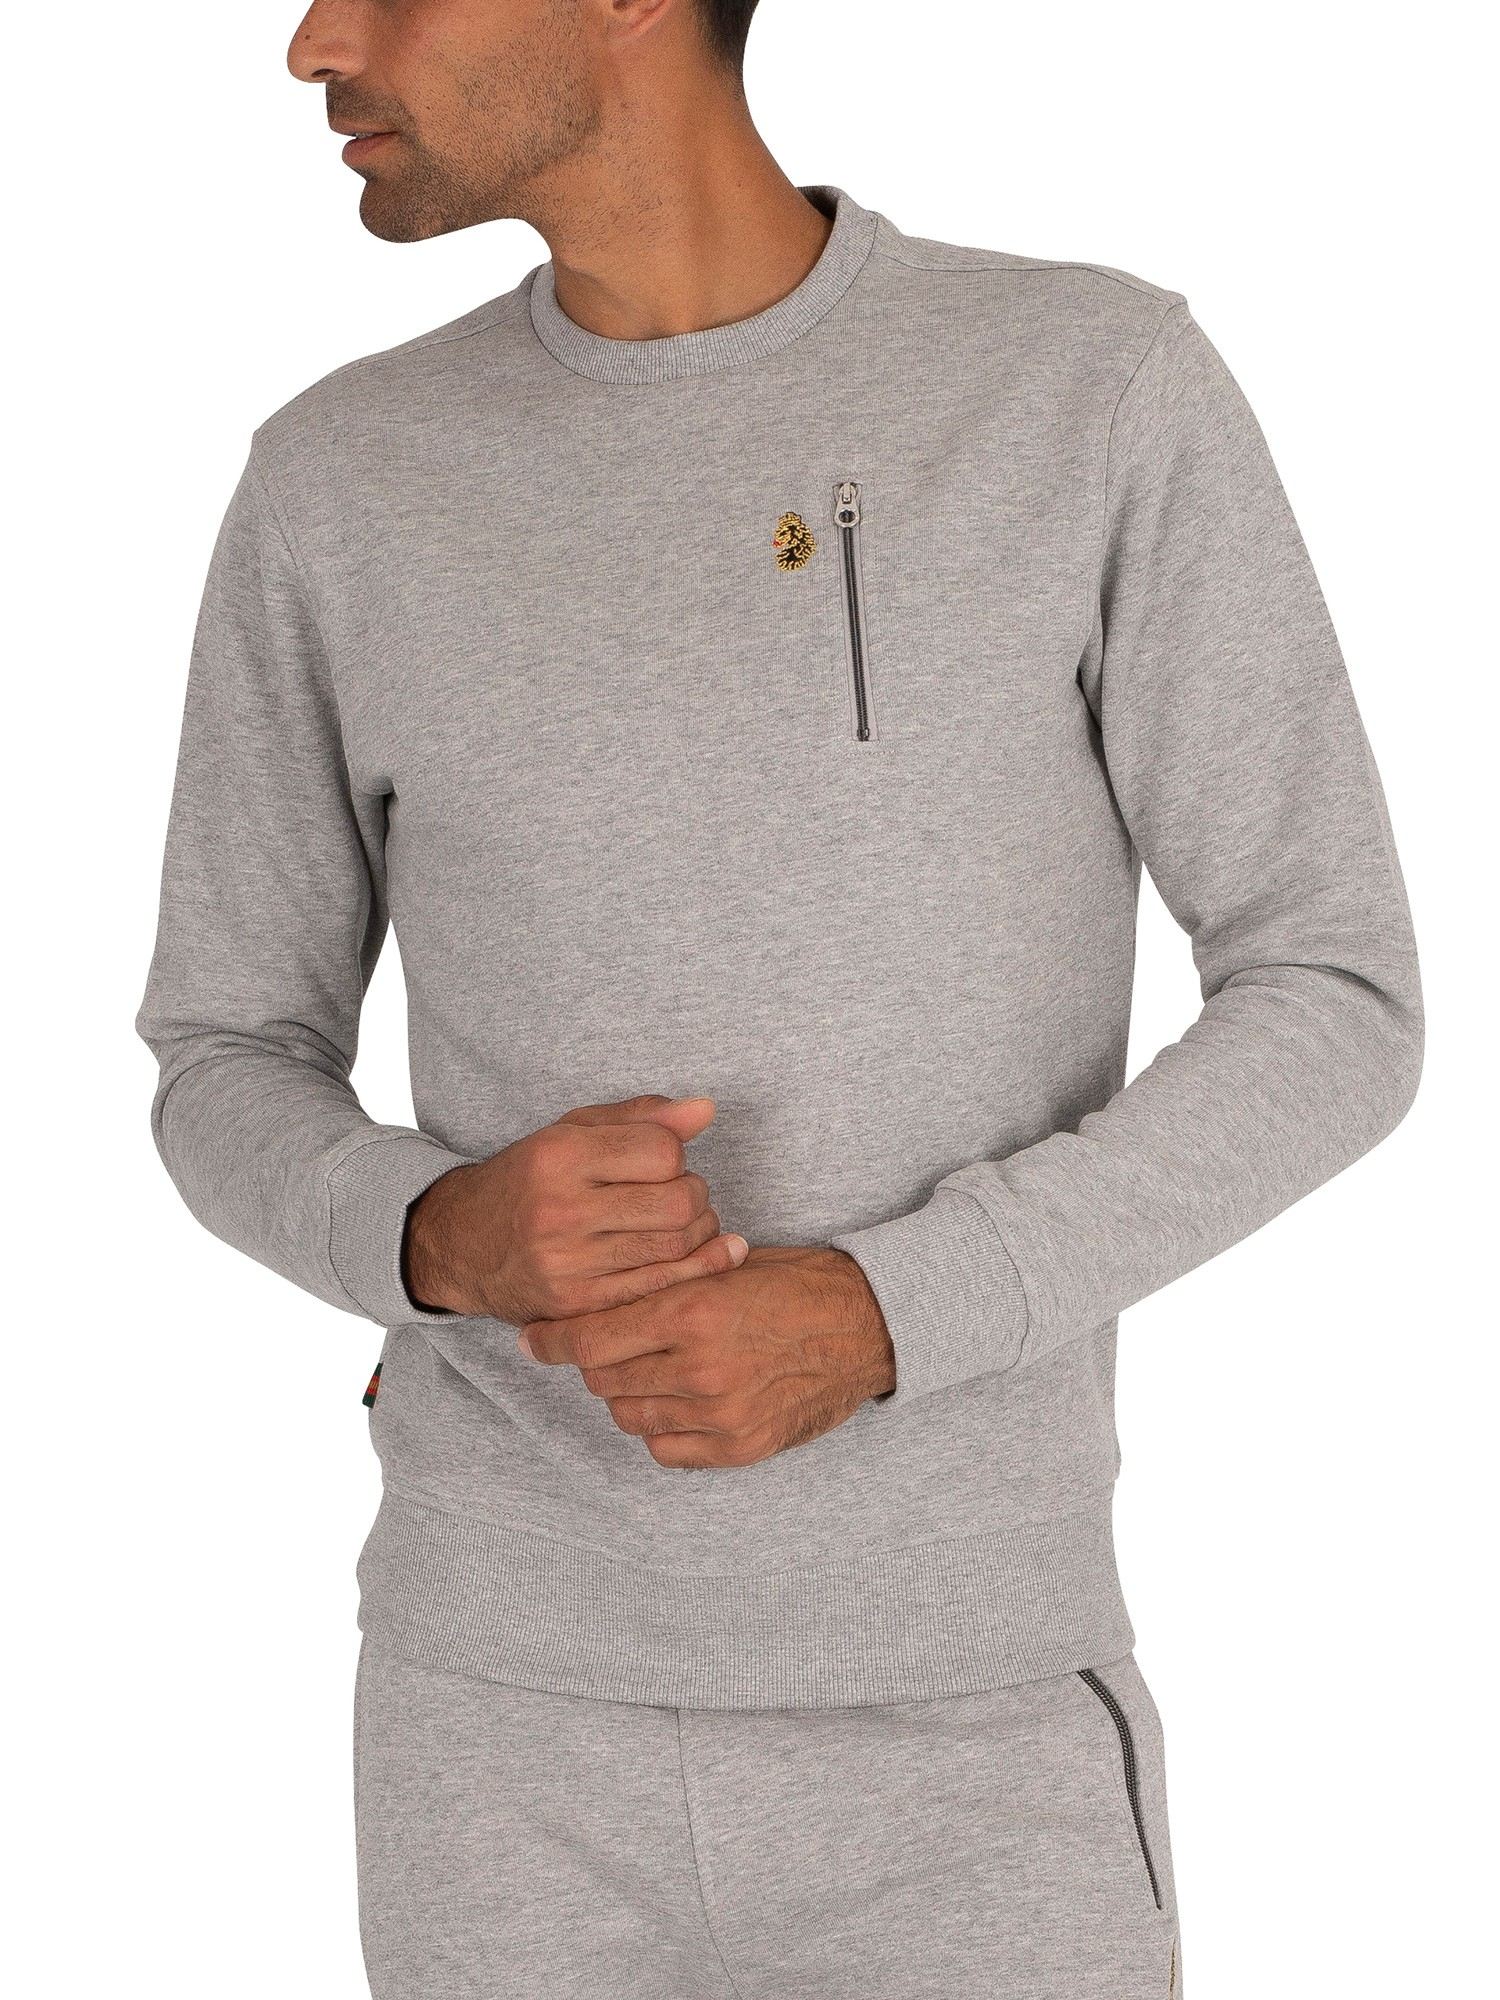 Paris-2-Sweatshirt